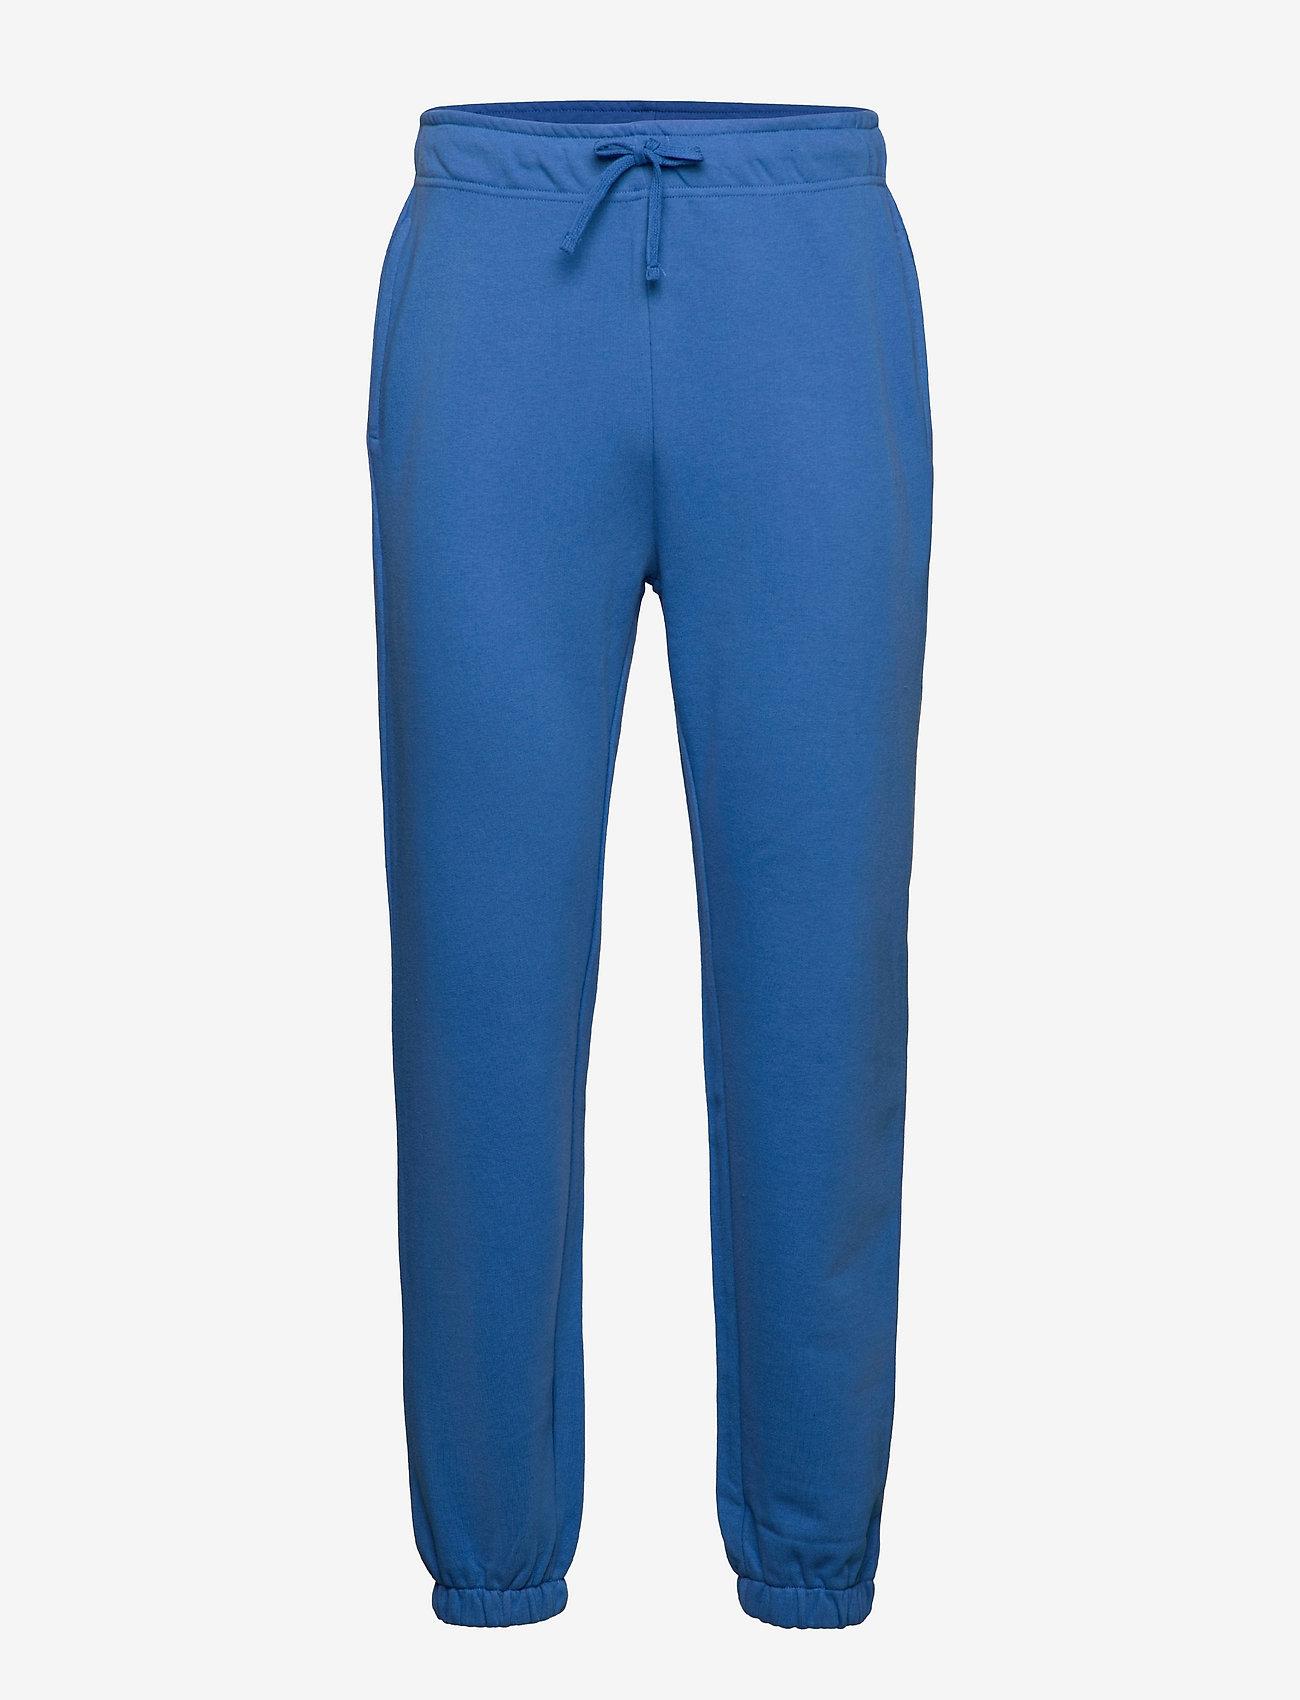 H2O - Couch Sweat Pants - kleding - cobalt blue - 0